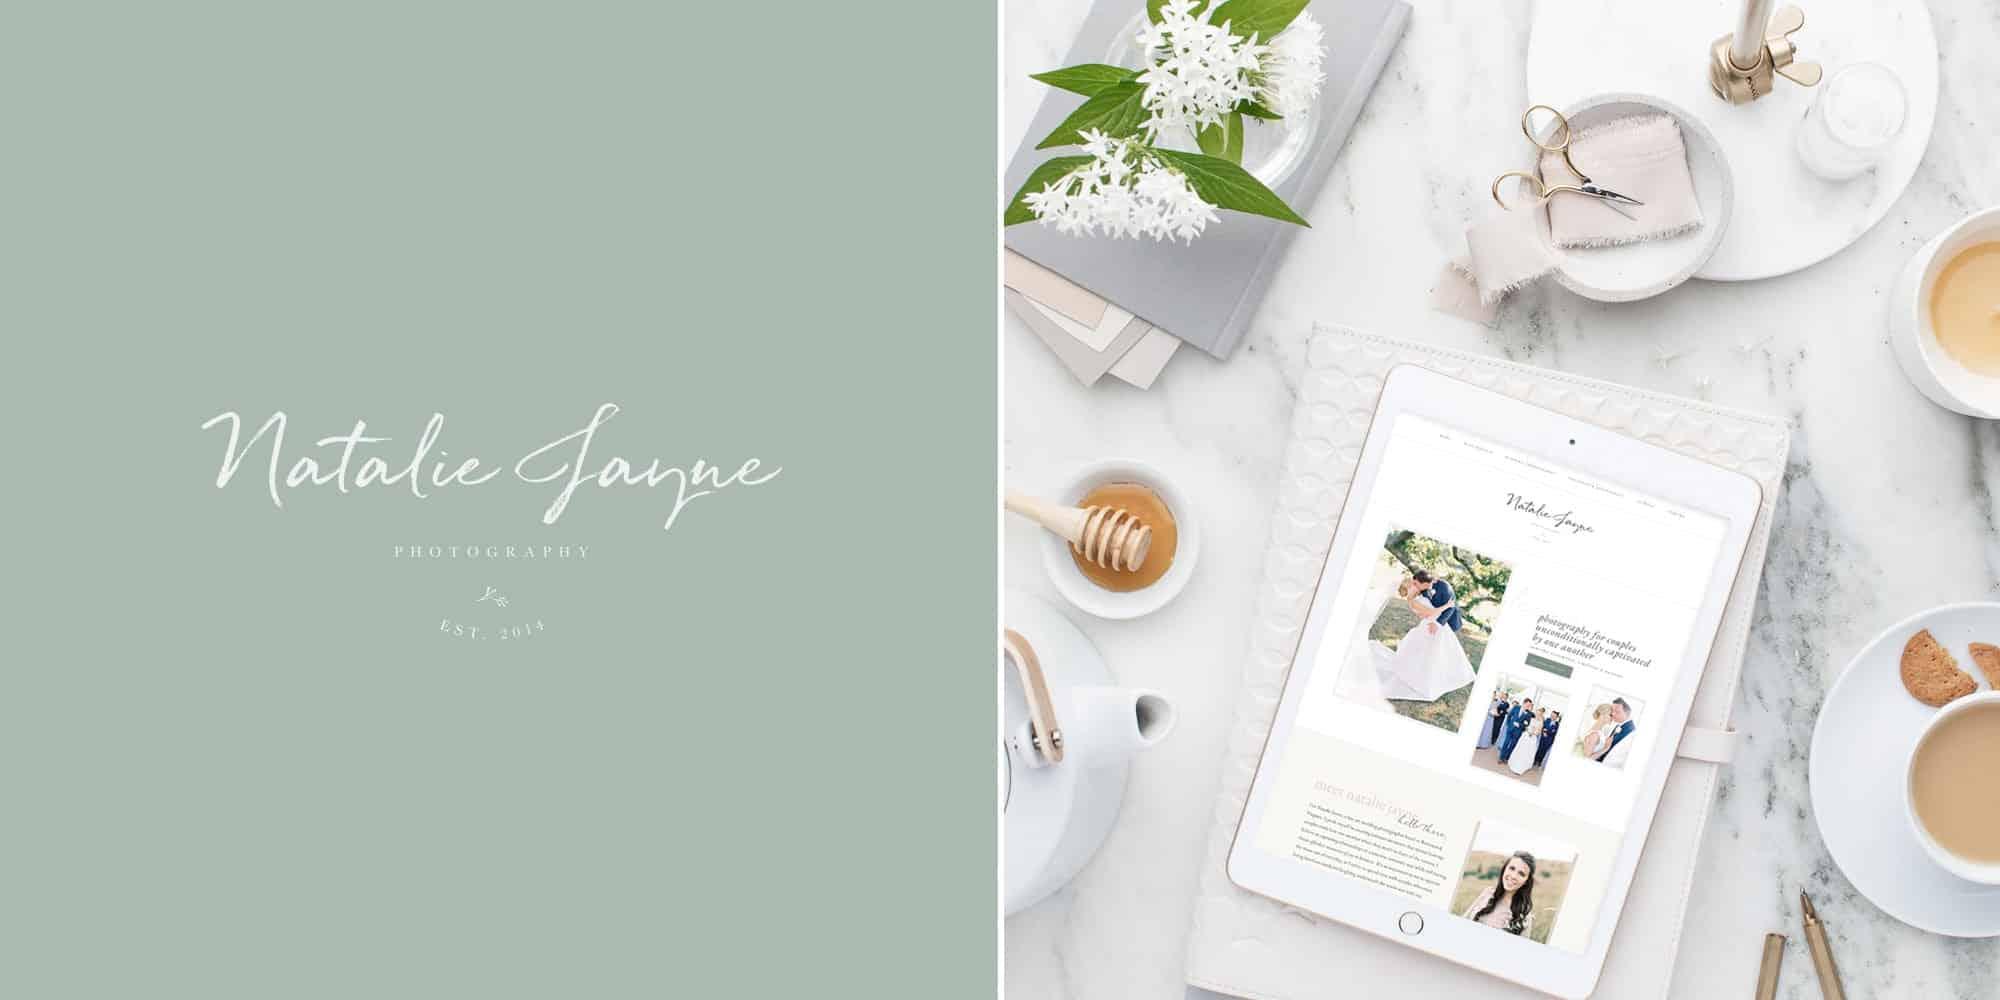 Custom Anthropologie inspired brand design for wedding photographer Natalie Jayne by Davey & Krista